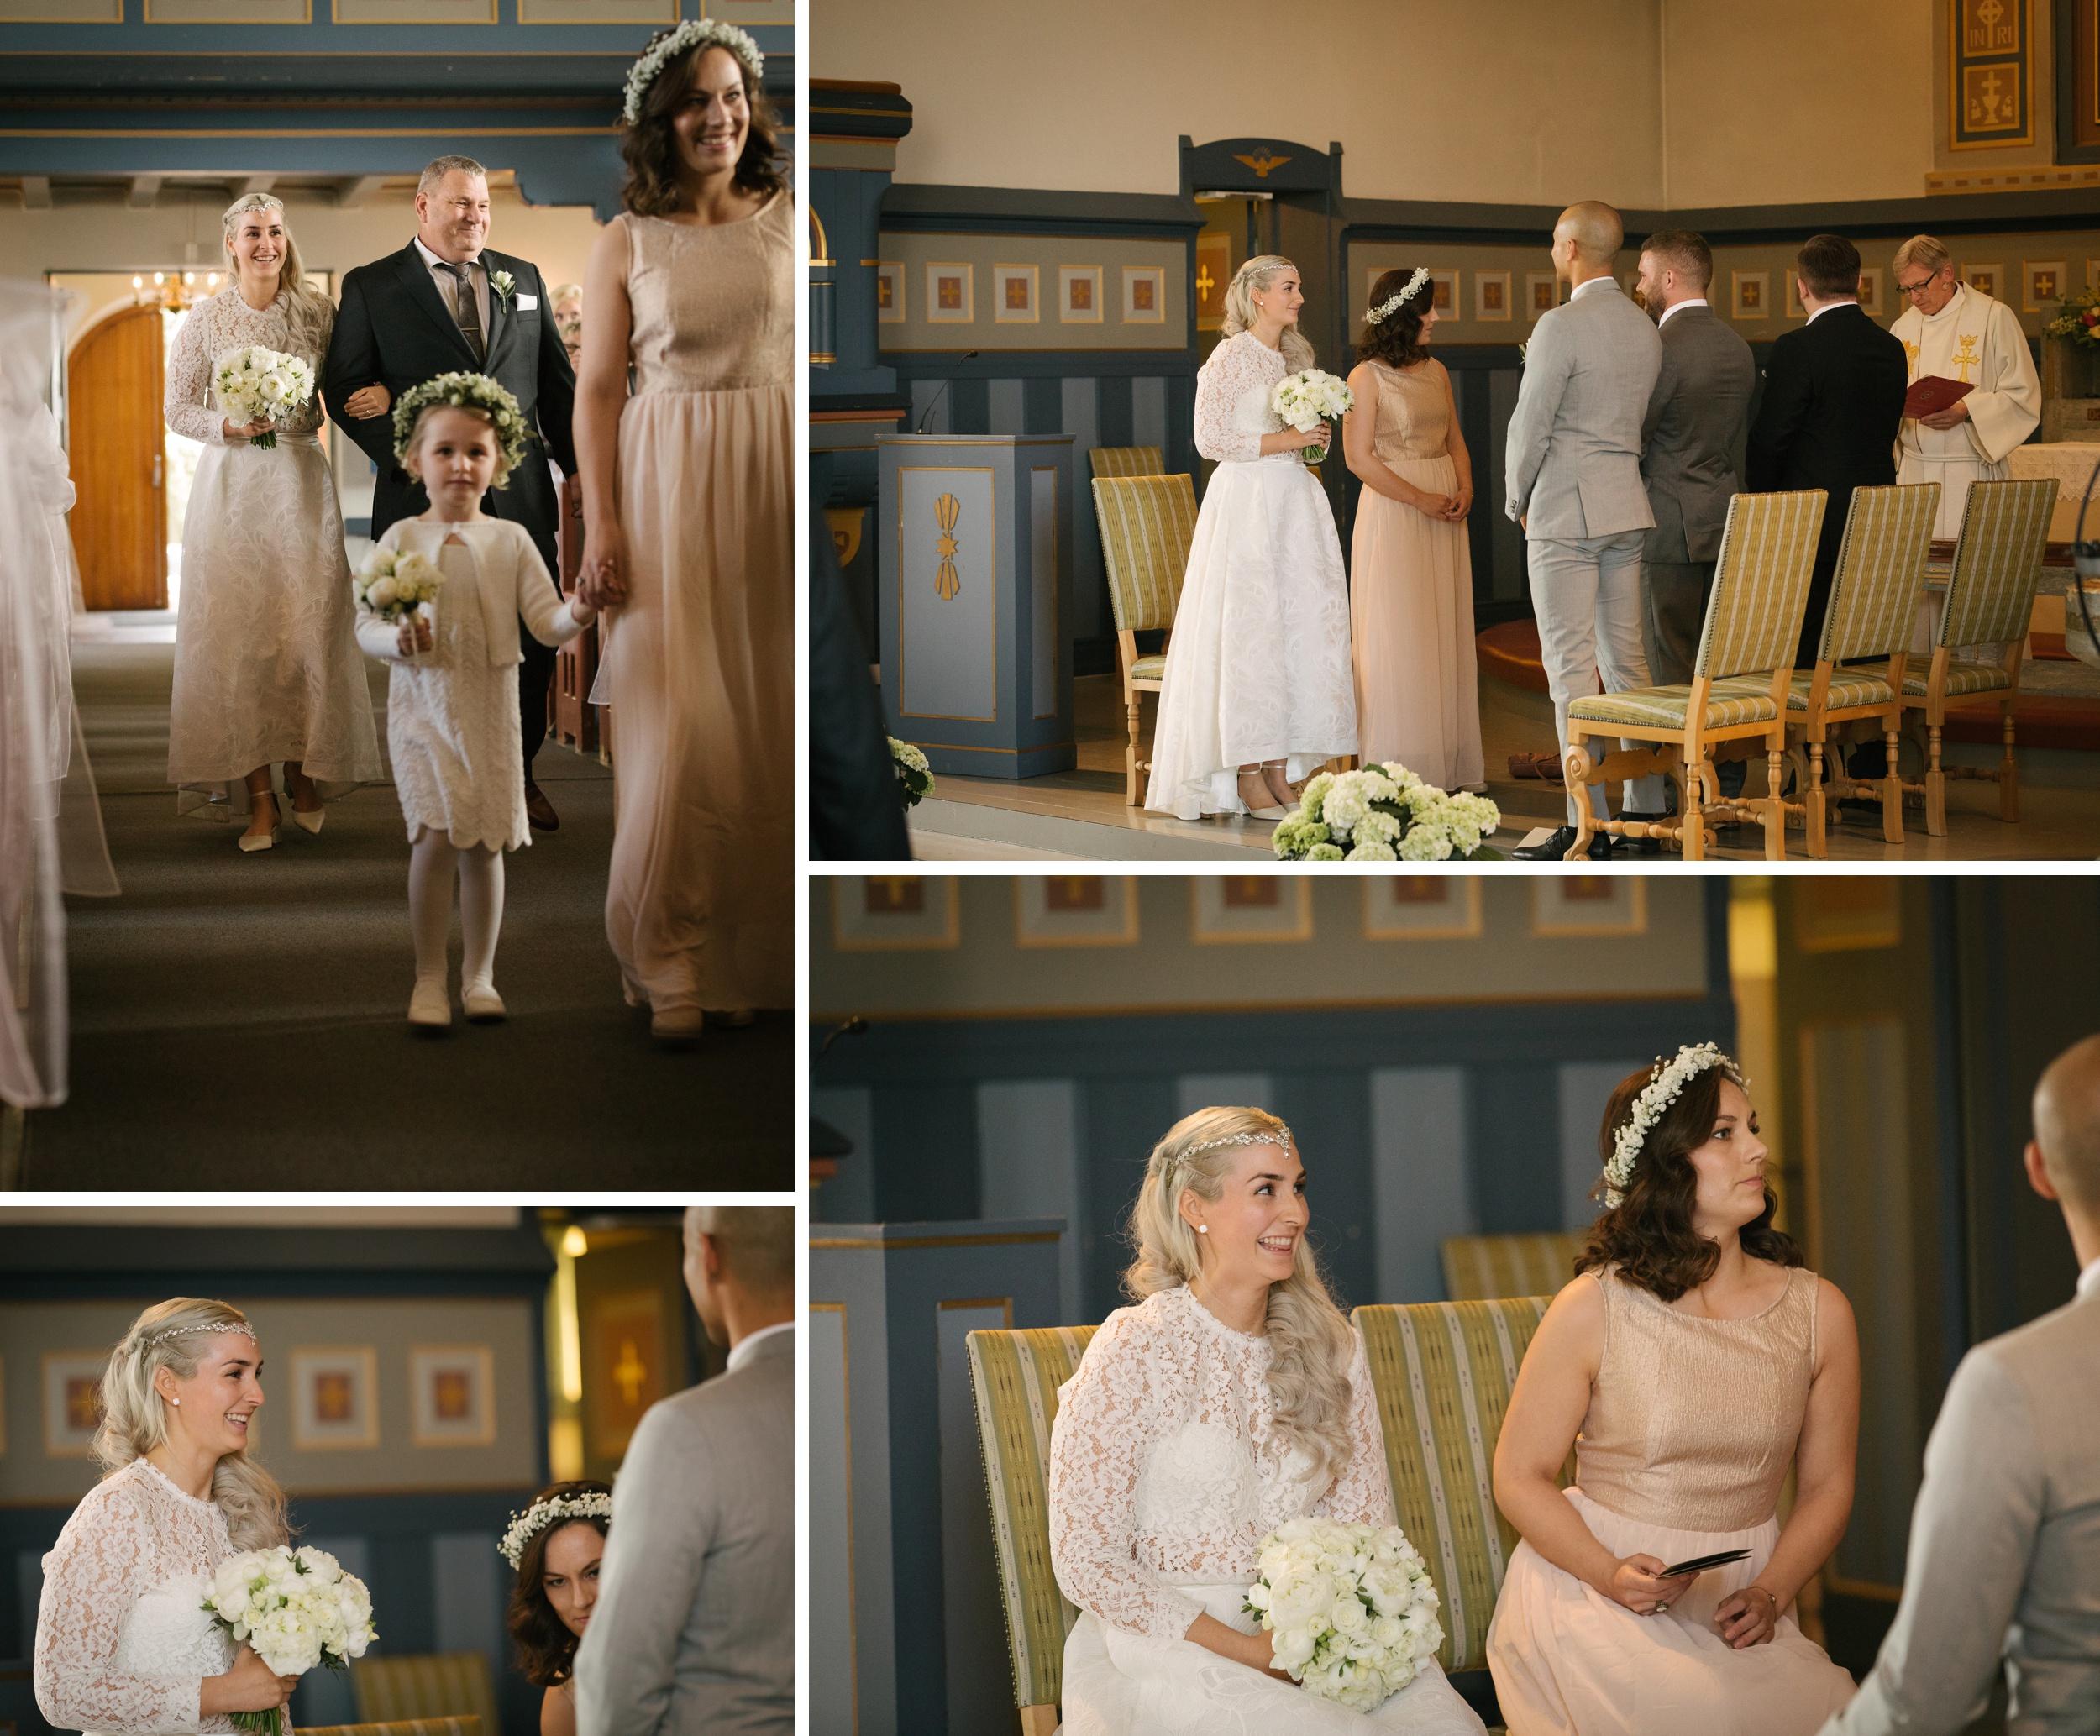 bryllup-bryllupsfotografering-bryllupsfotograf-sarpsborg-20170520-_H2A0298Camilla-og-ruben_WEB.jpg